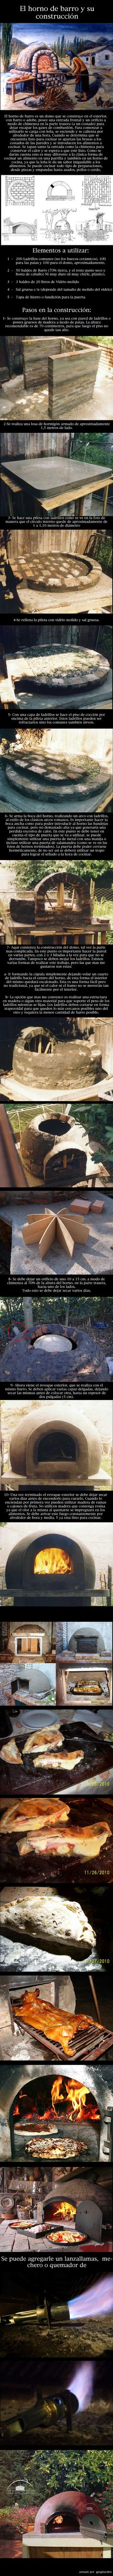 Como hacer un horno de barro